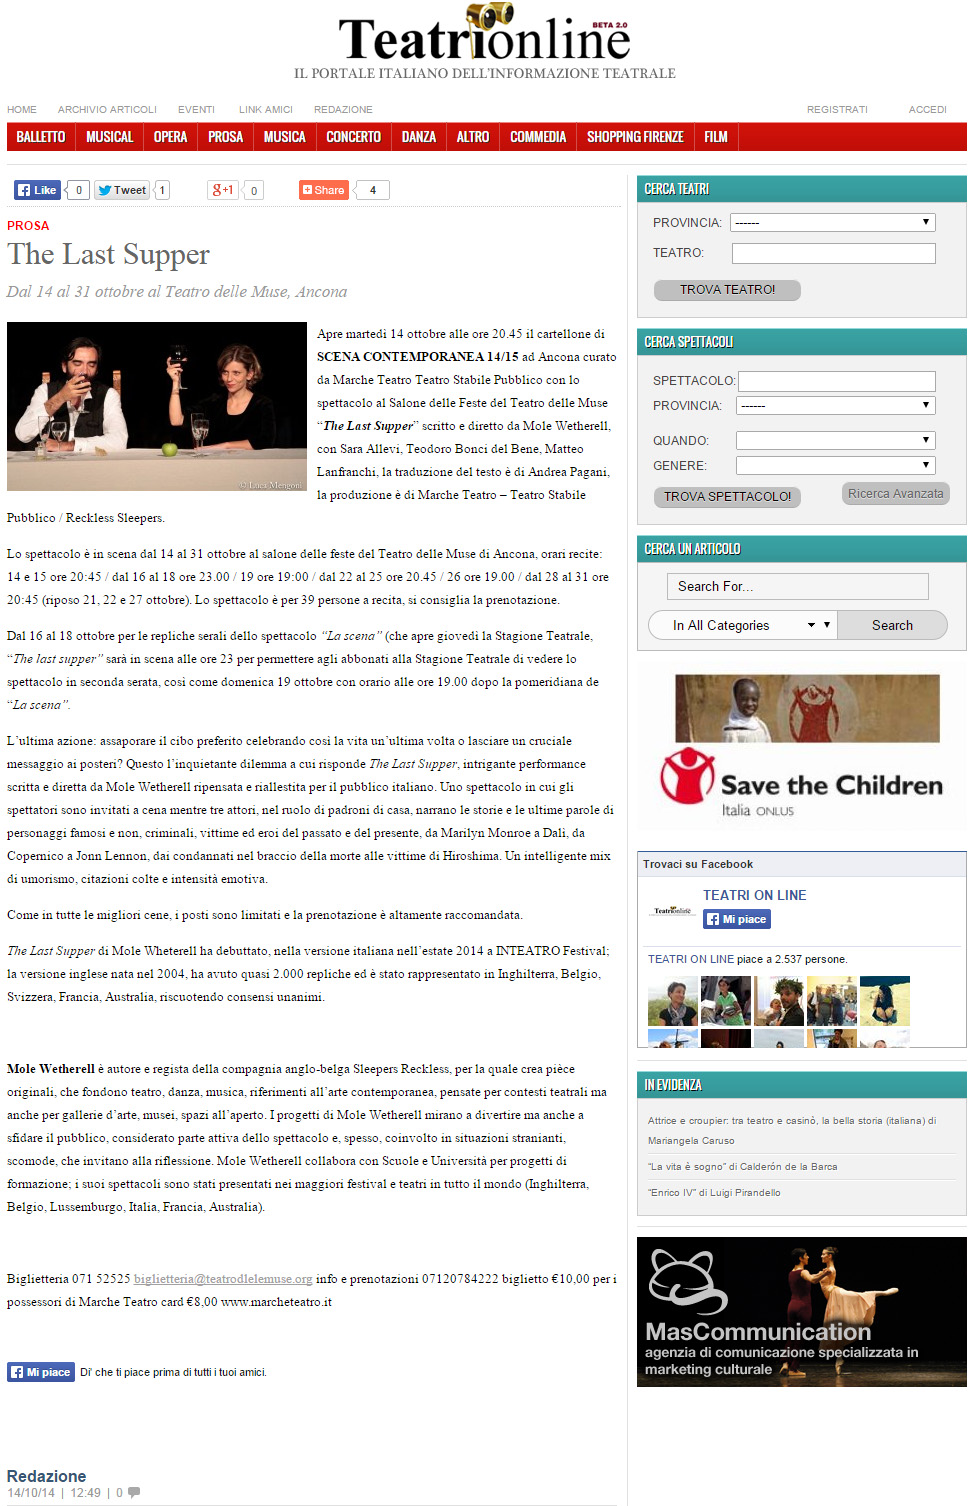 2014.10.14 the last supper - teatrionline.com